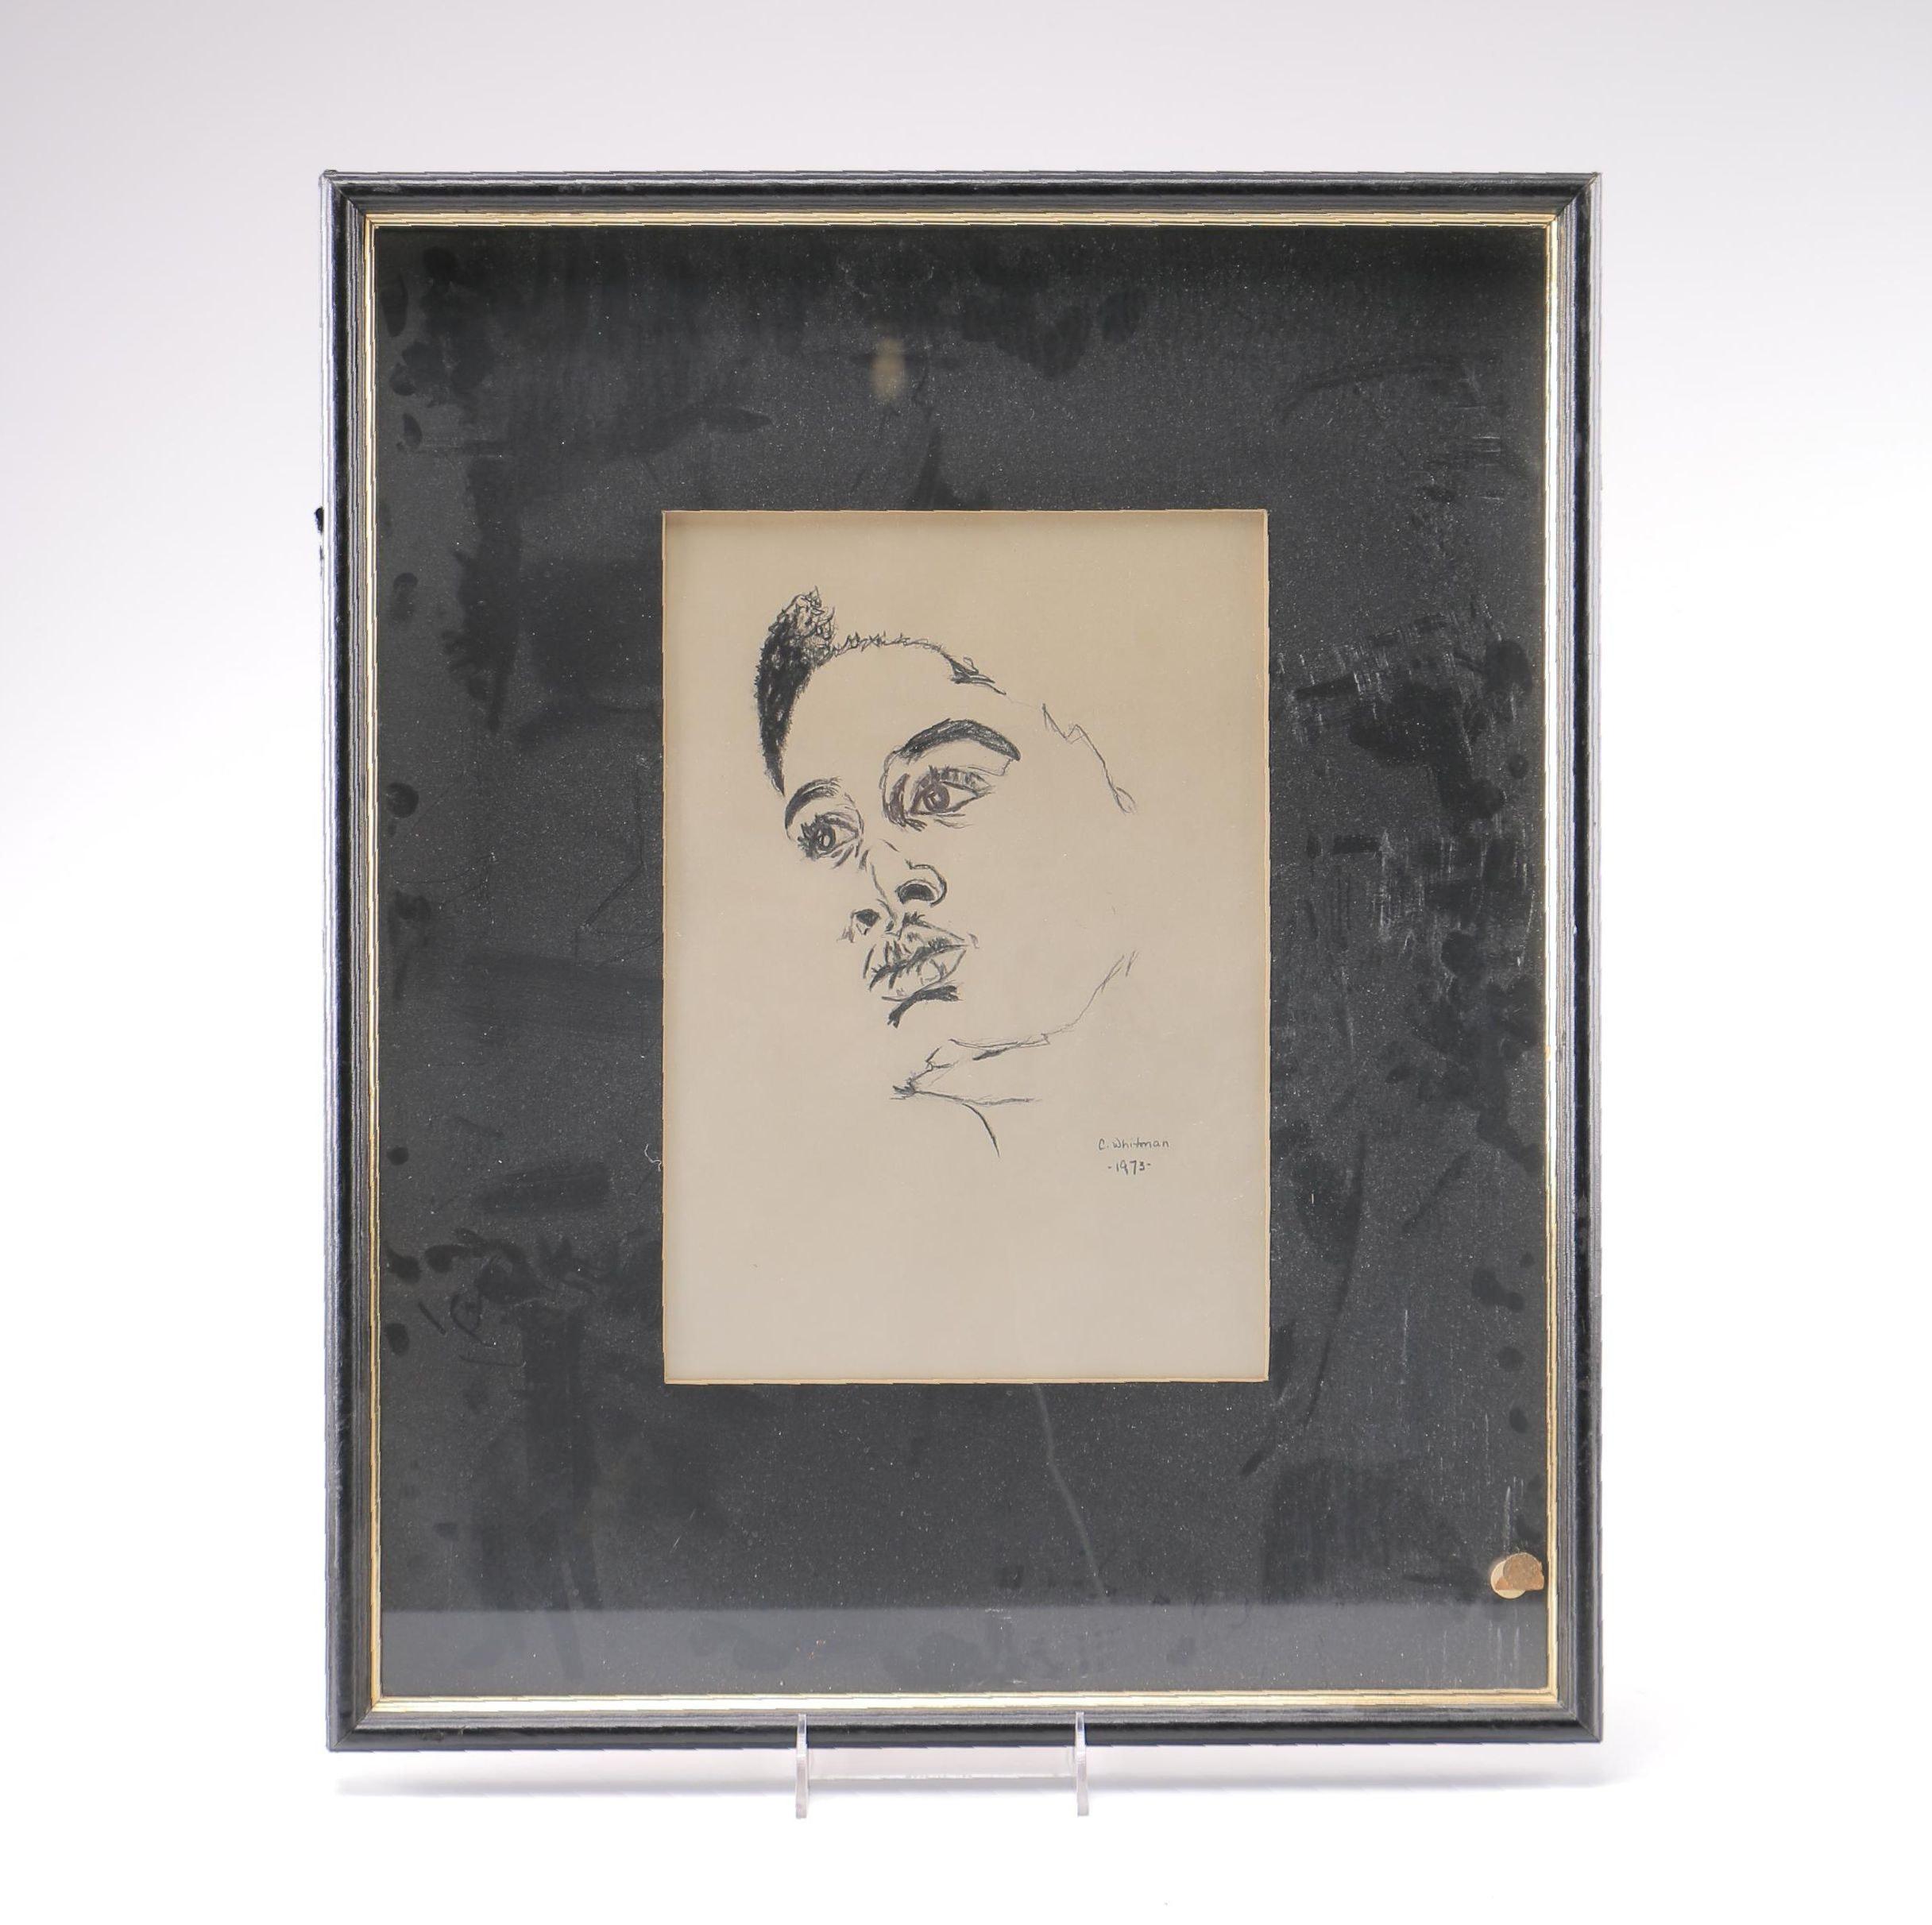 C. Whitman Charcoal Sketch of Woman's Profile